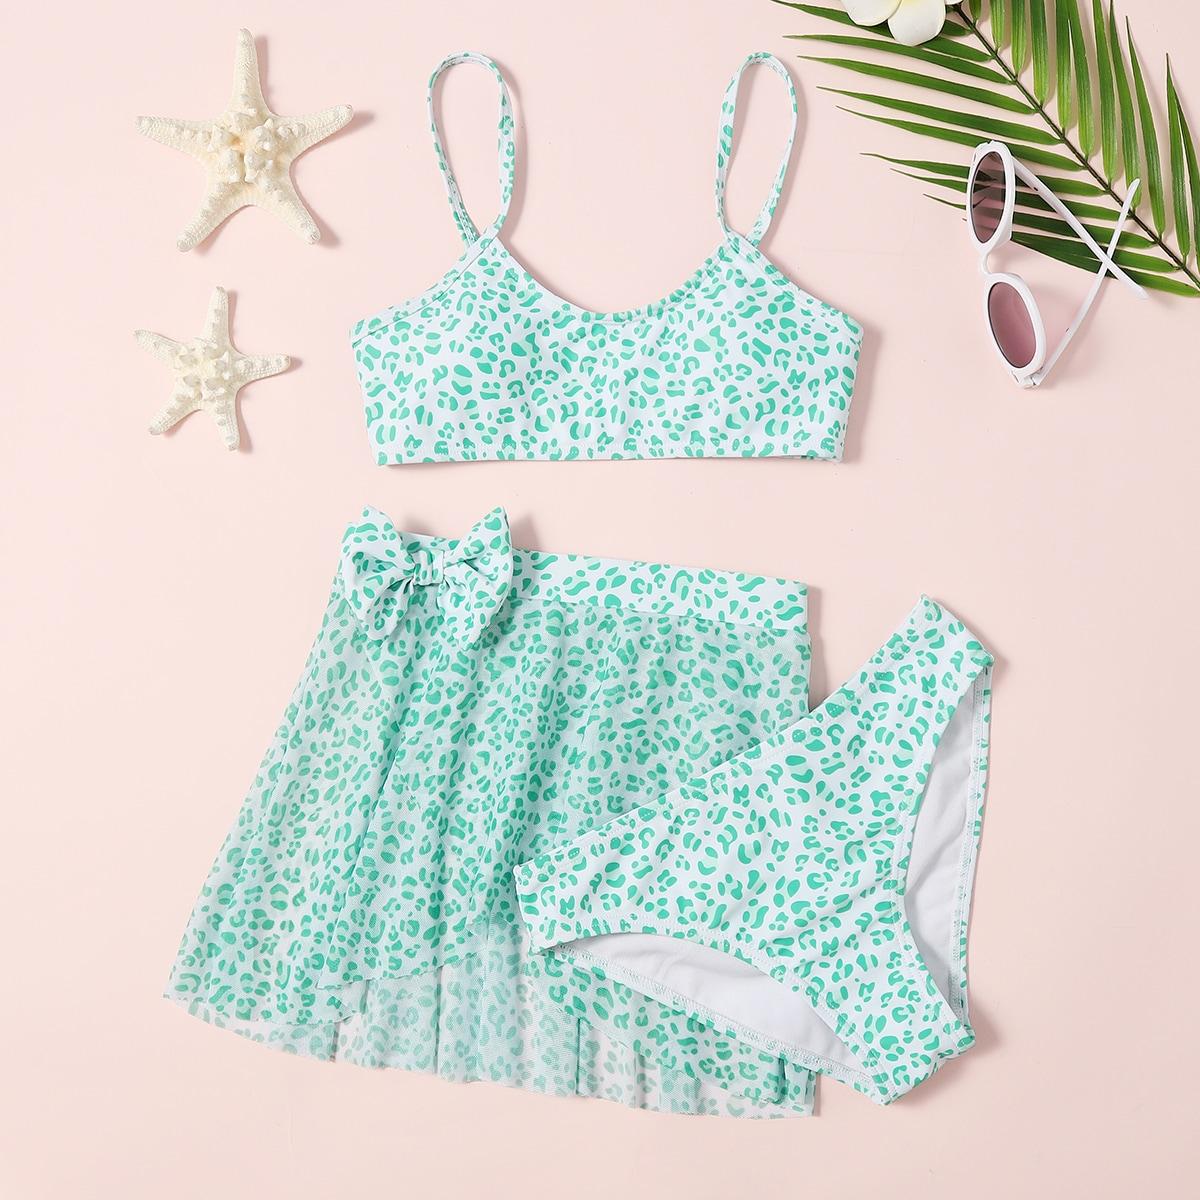 SHEIN / 3pack Girls Leopard Bikini Swimsuit & Beach Skirt